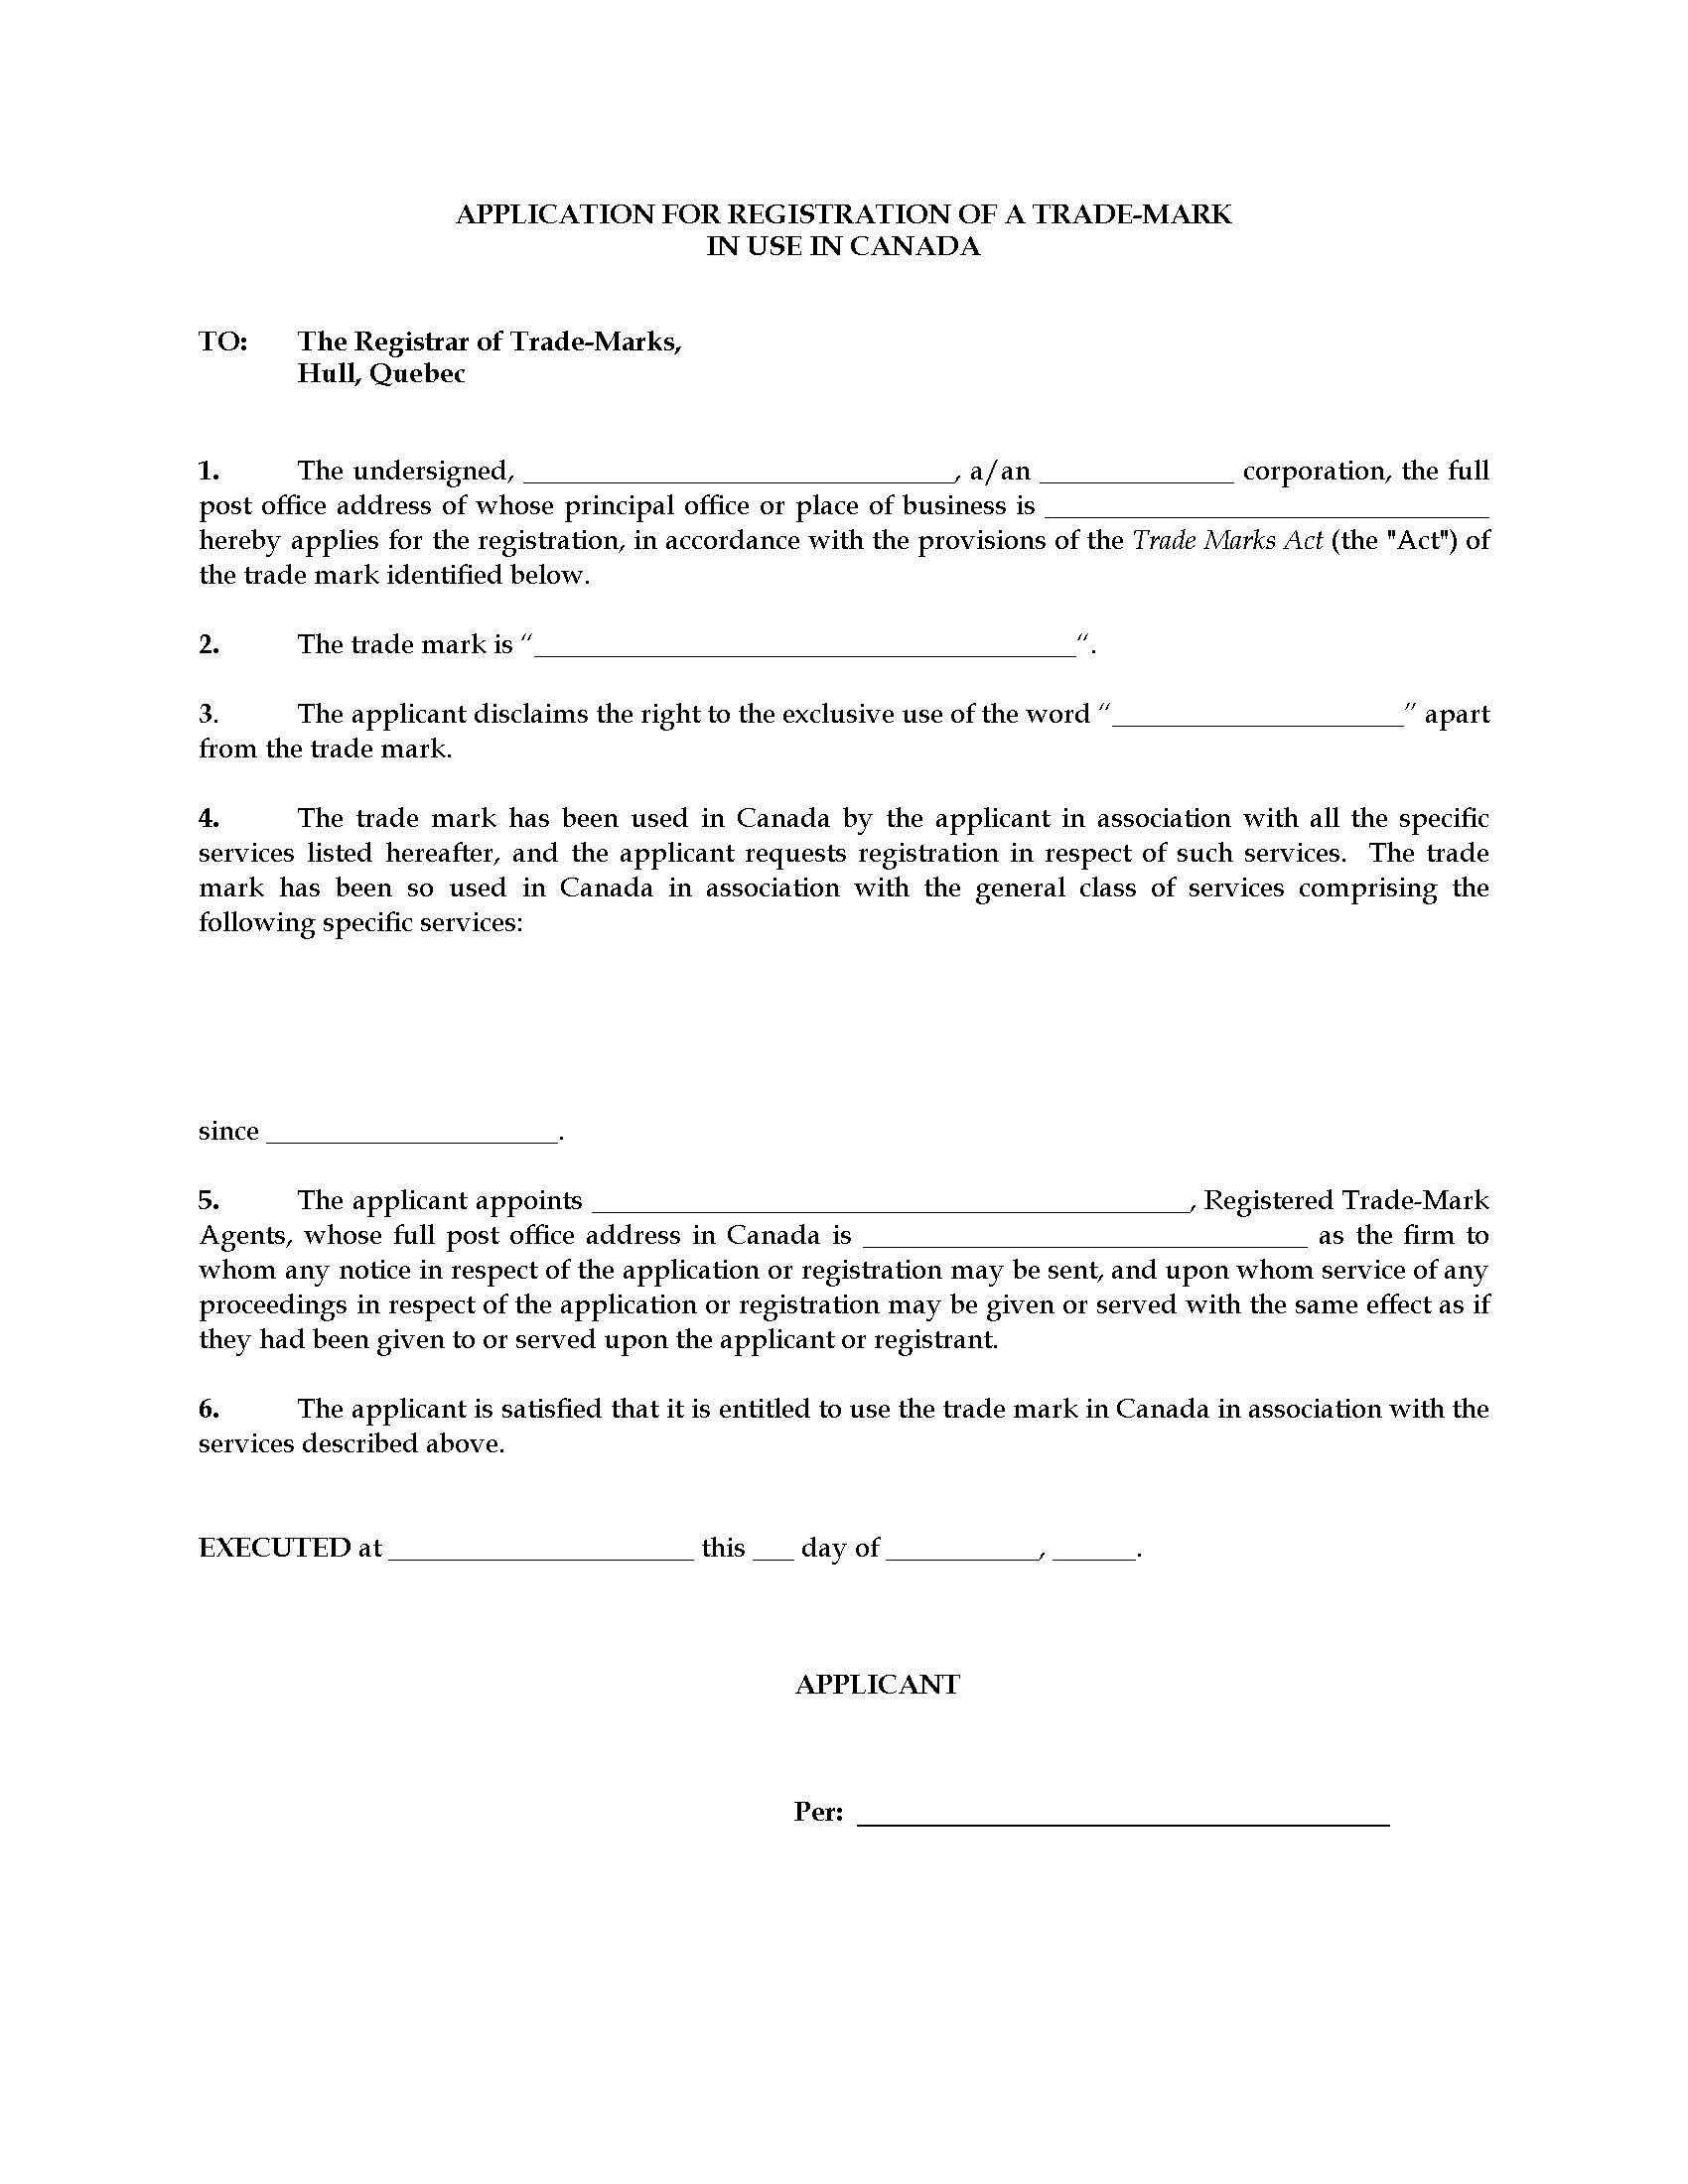 Canada Trade Mark Application Form 1